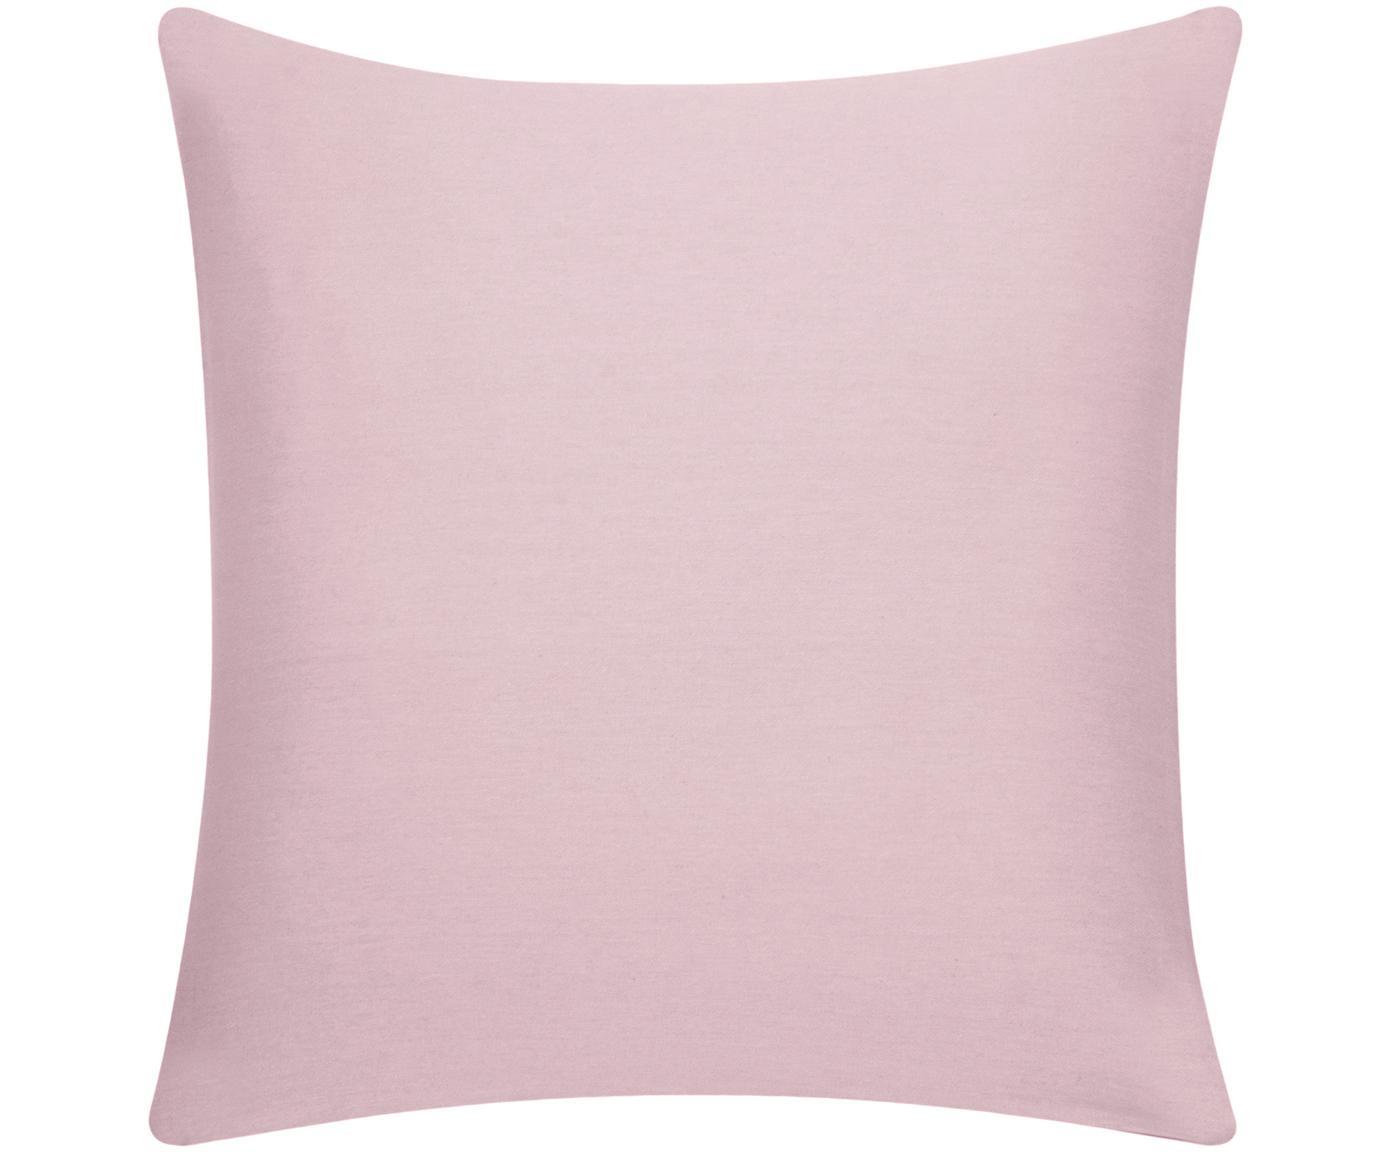 Kussenhoes Mads, 100% katoen, Roze, 40 x 40 cm